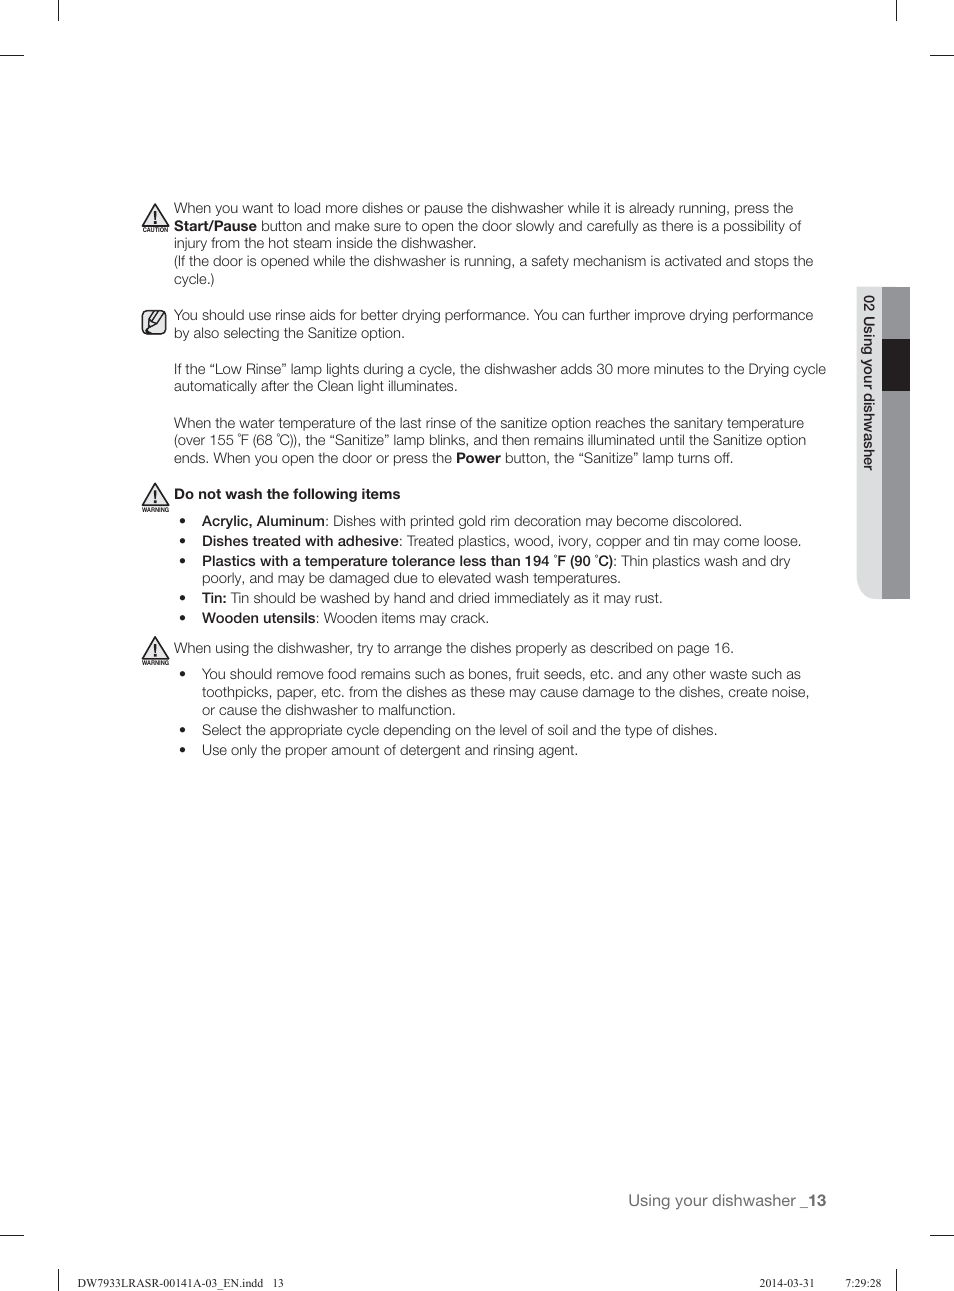 Using Your Dishwasher | Samsung DW7933LRABB AC User Manual | Page 13 / 96